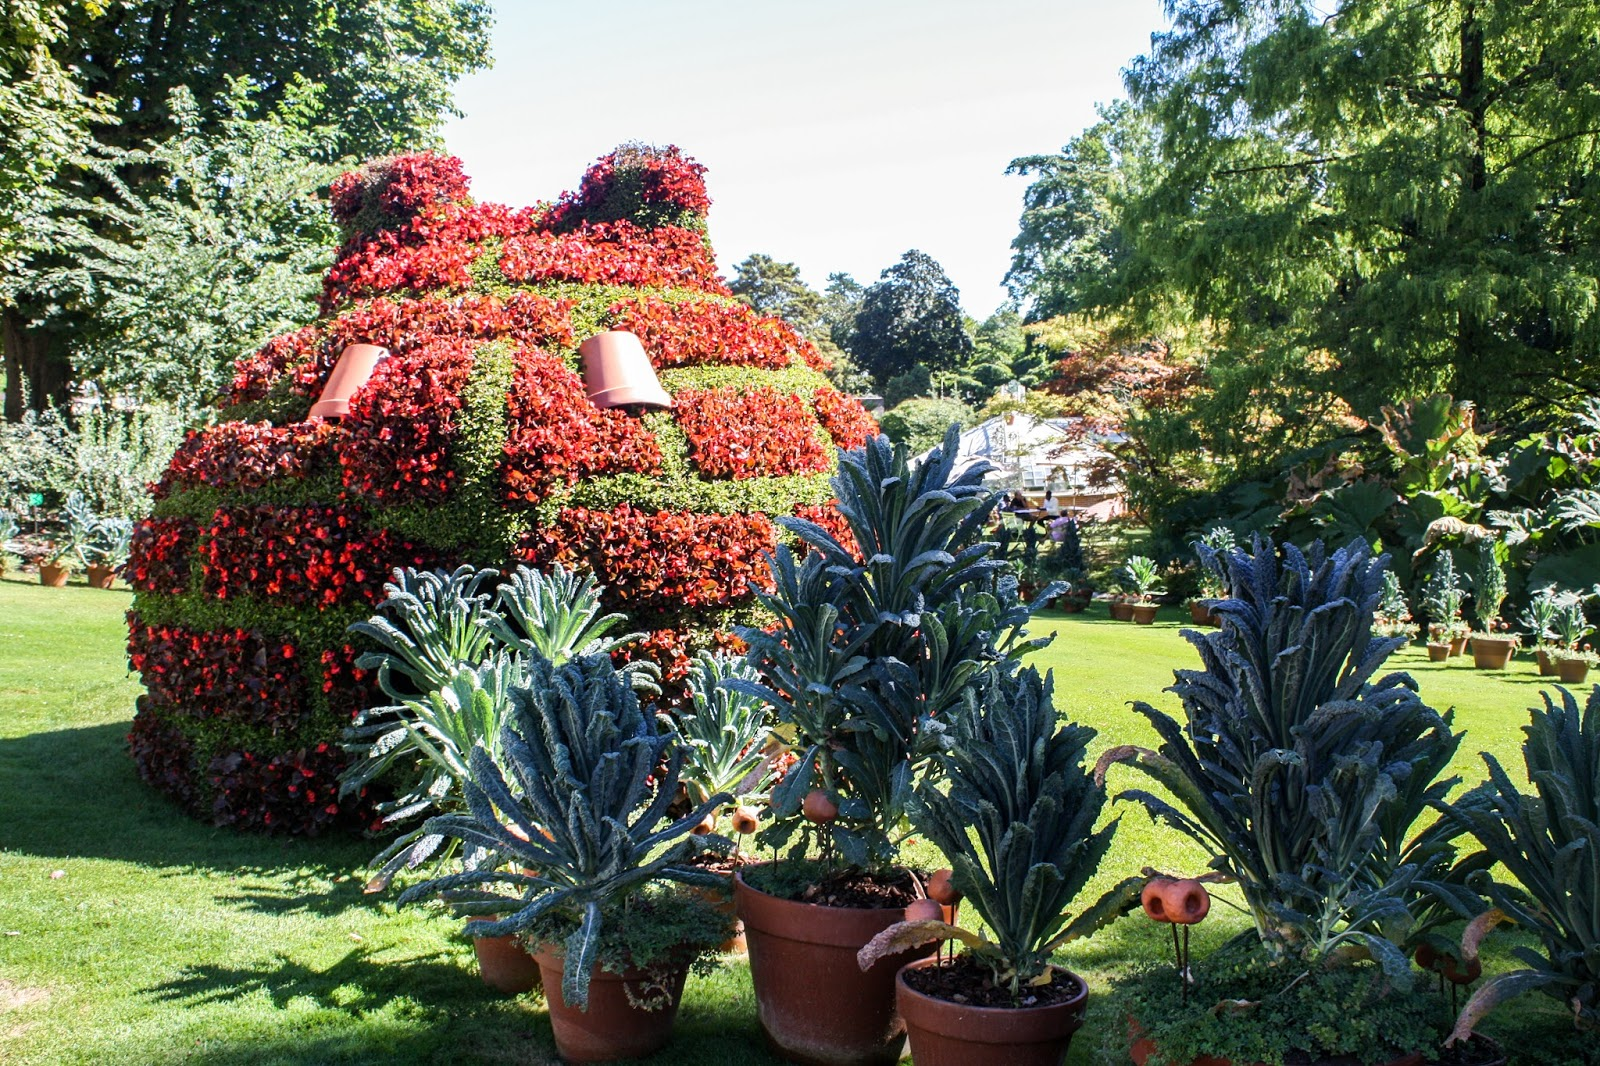 jardin des plantes nantes, nantes, jardin des plantes